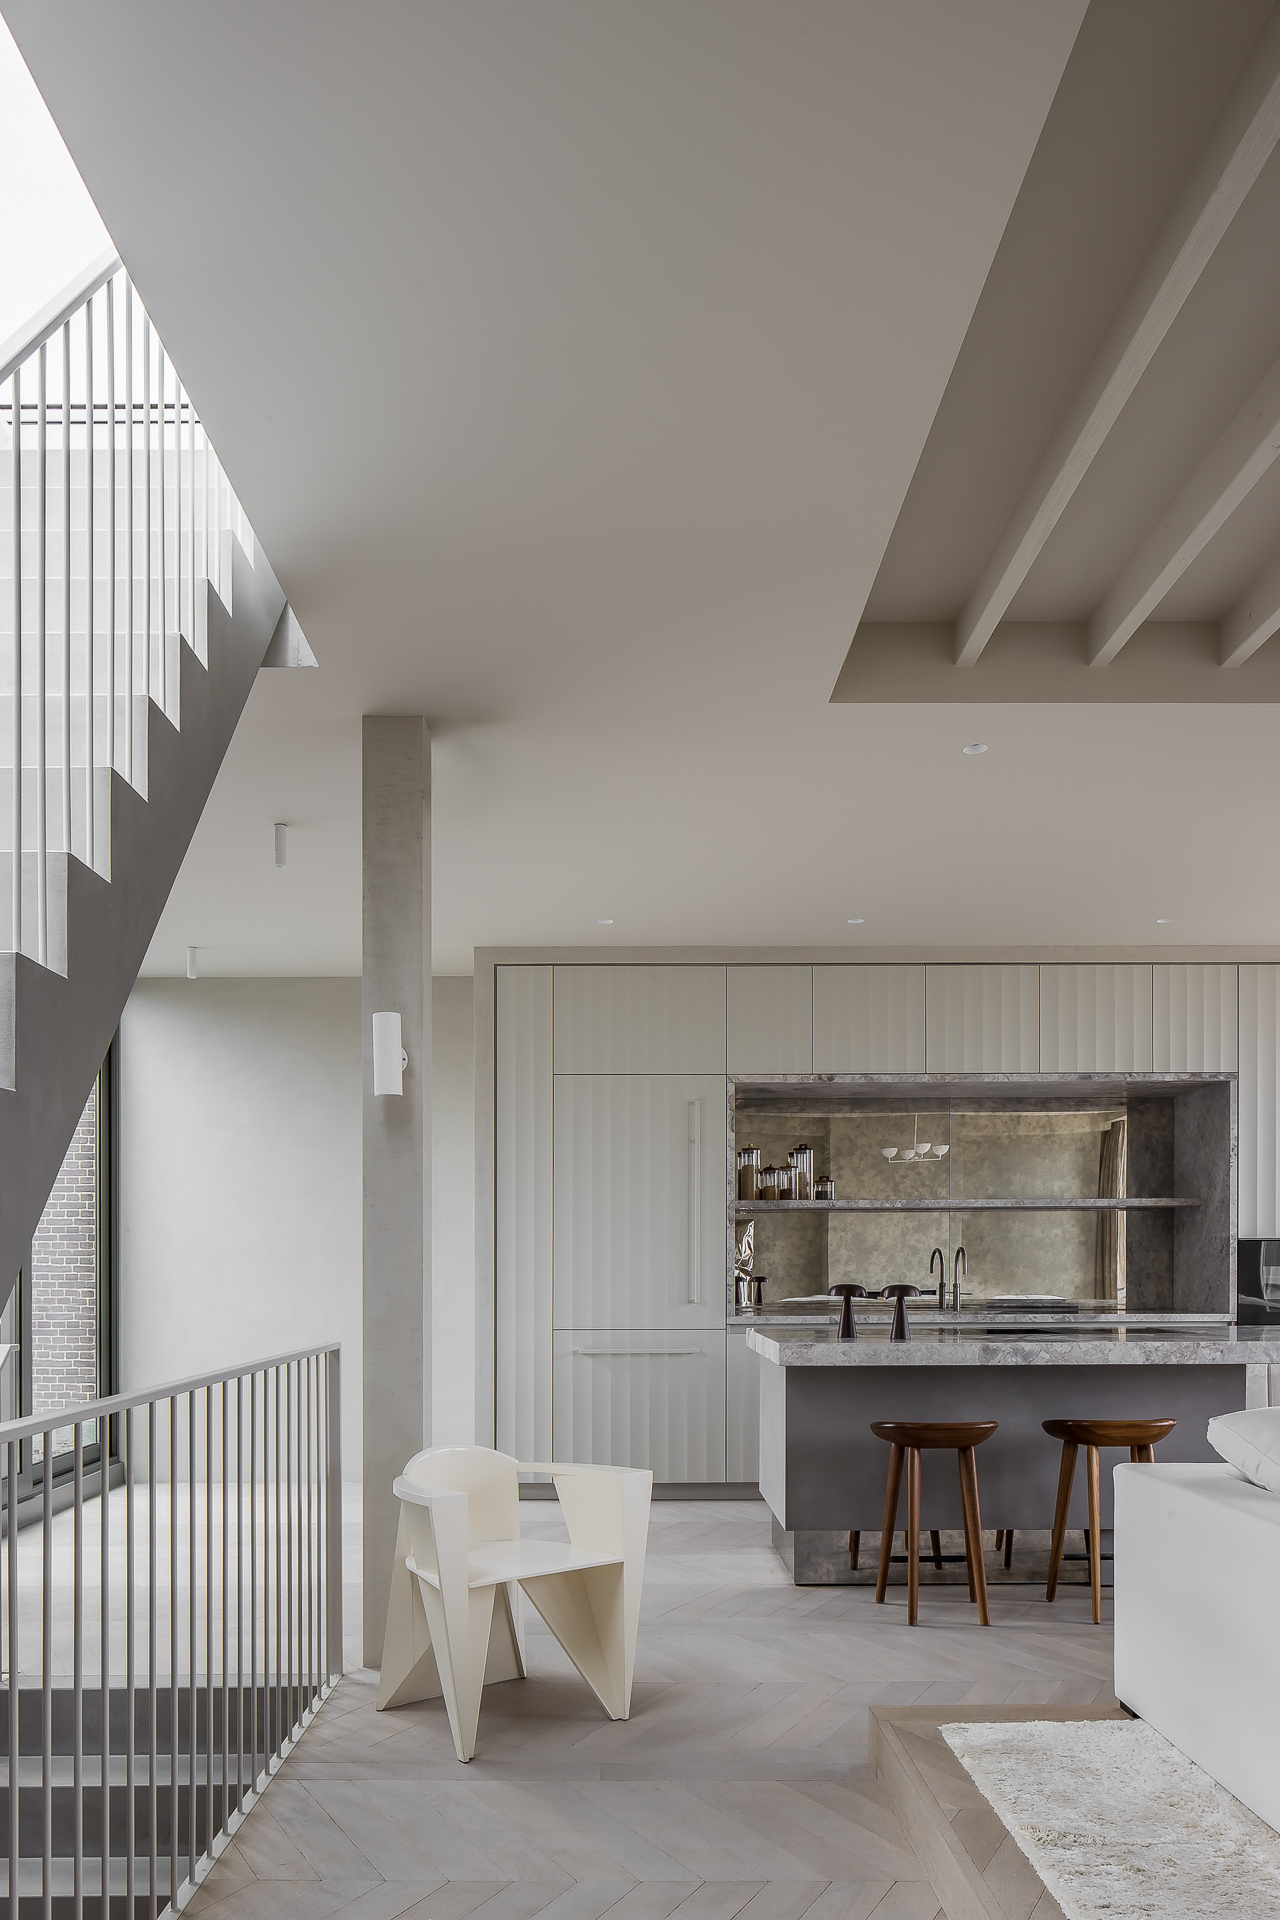 Framework Studio Residential 610 Weesperzijde Amsterdam Penthouse Photo Thomas De Bruyne Cafeine Yellowtrace 03